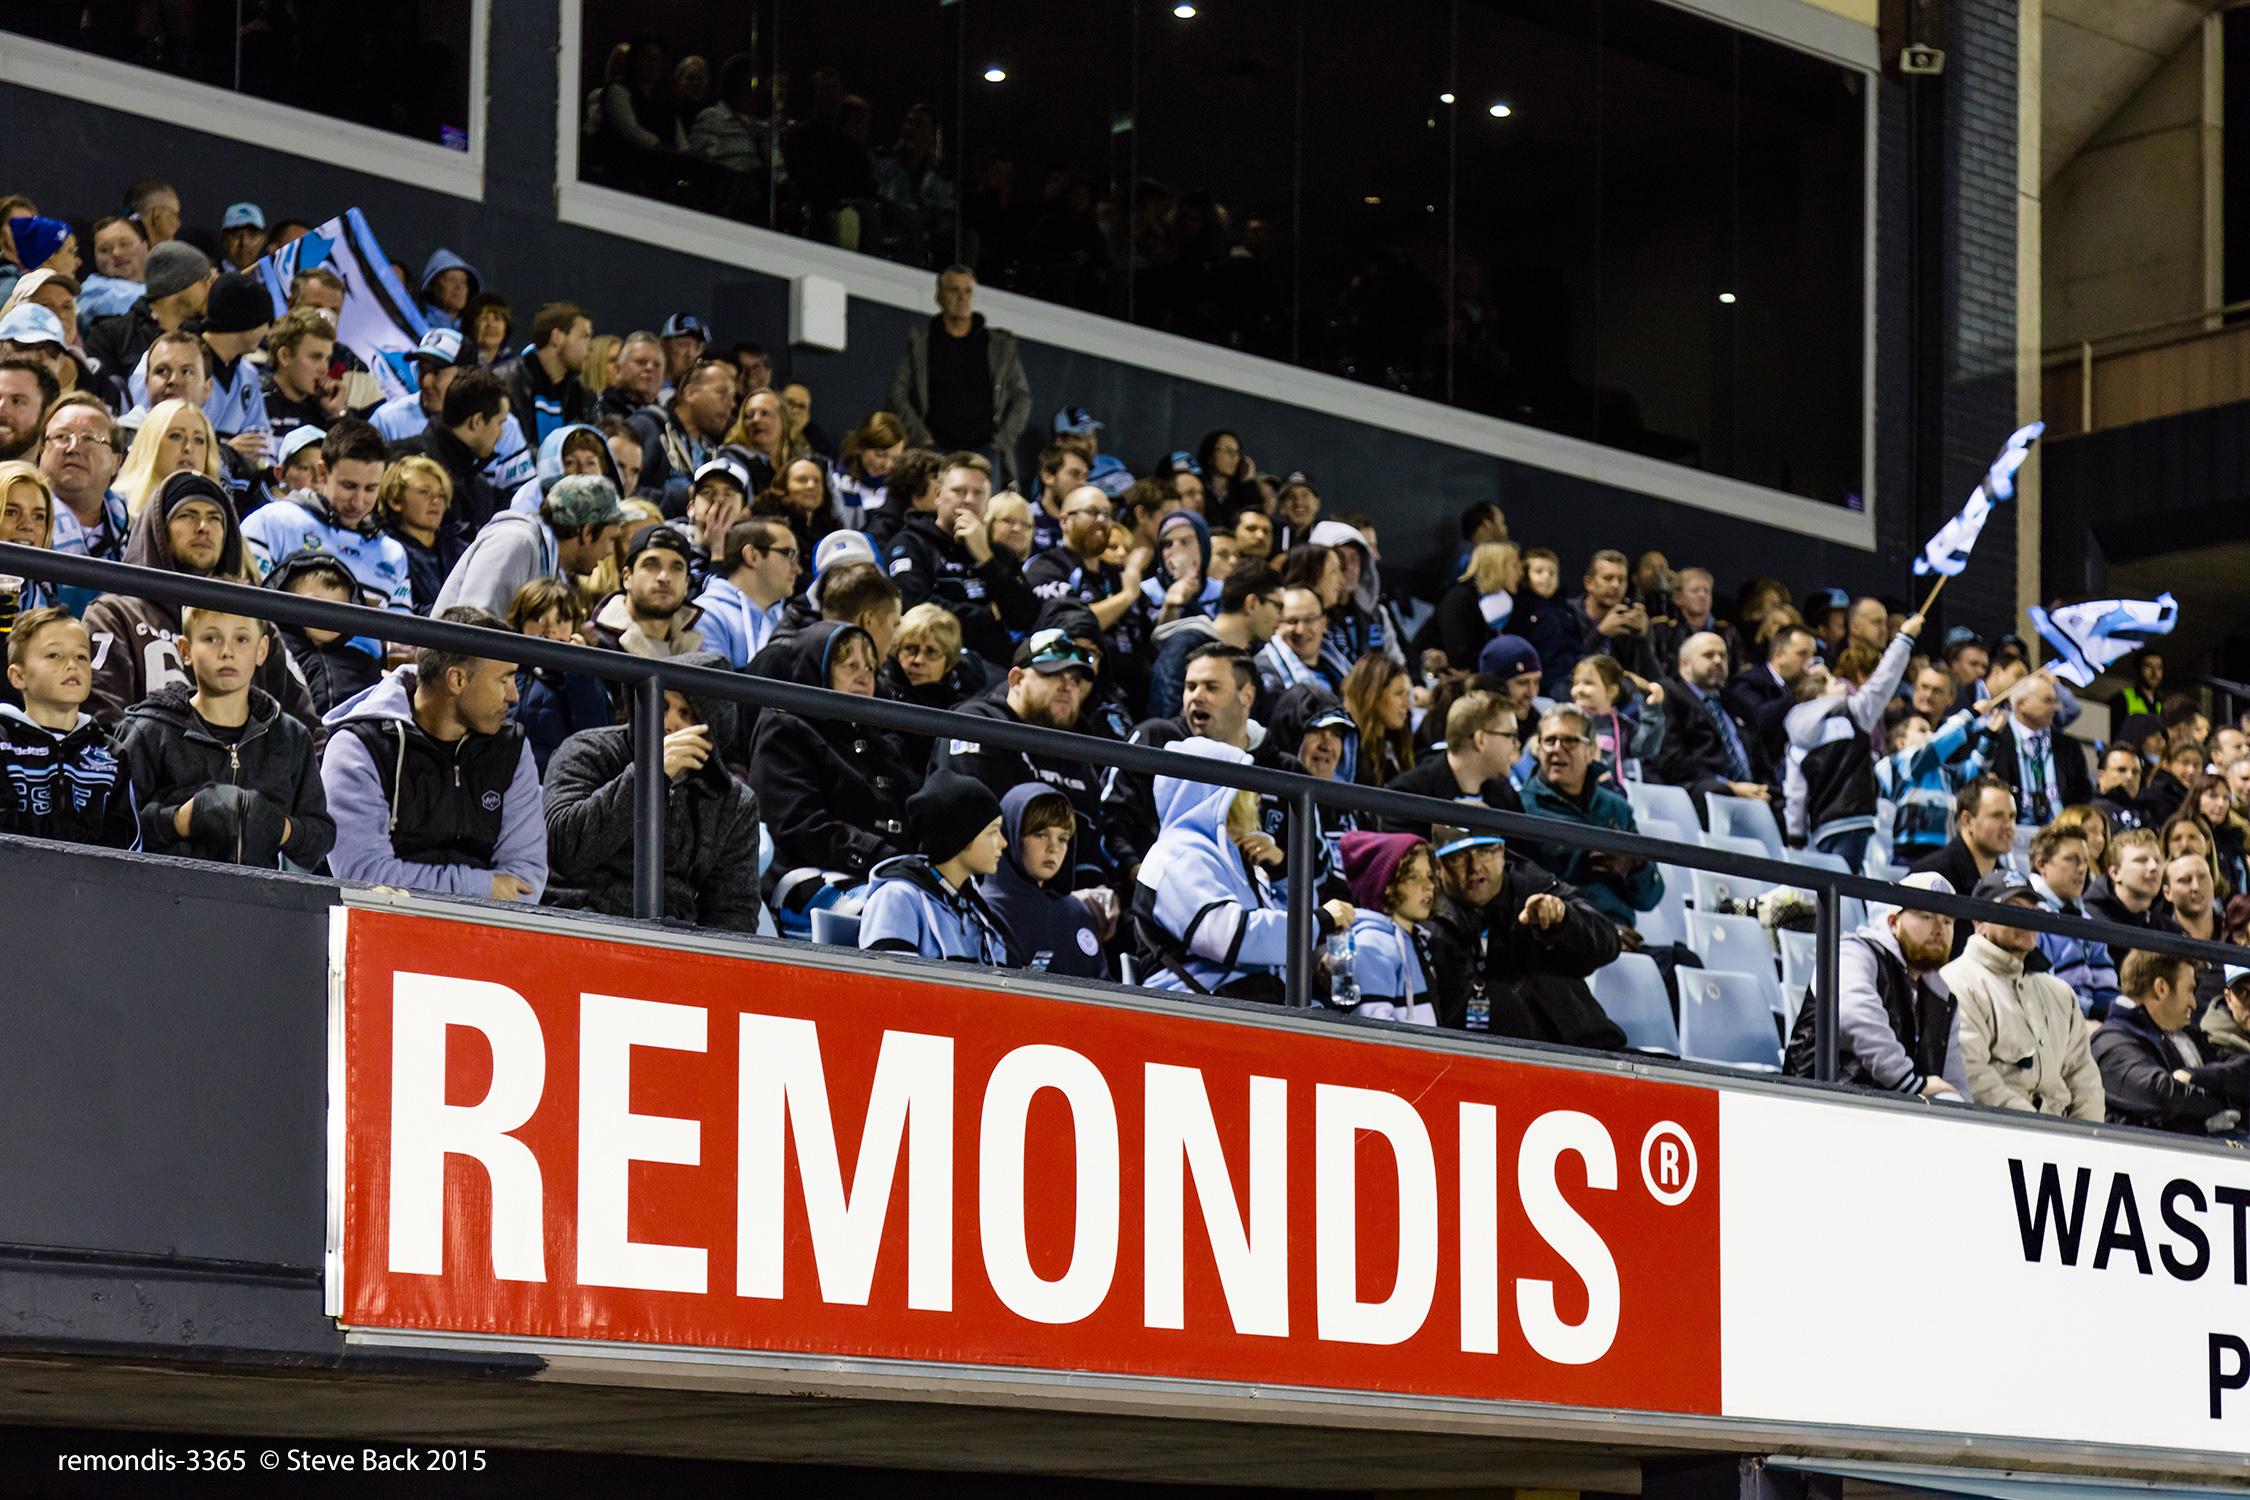 remondis-3365.jpg